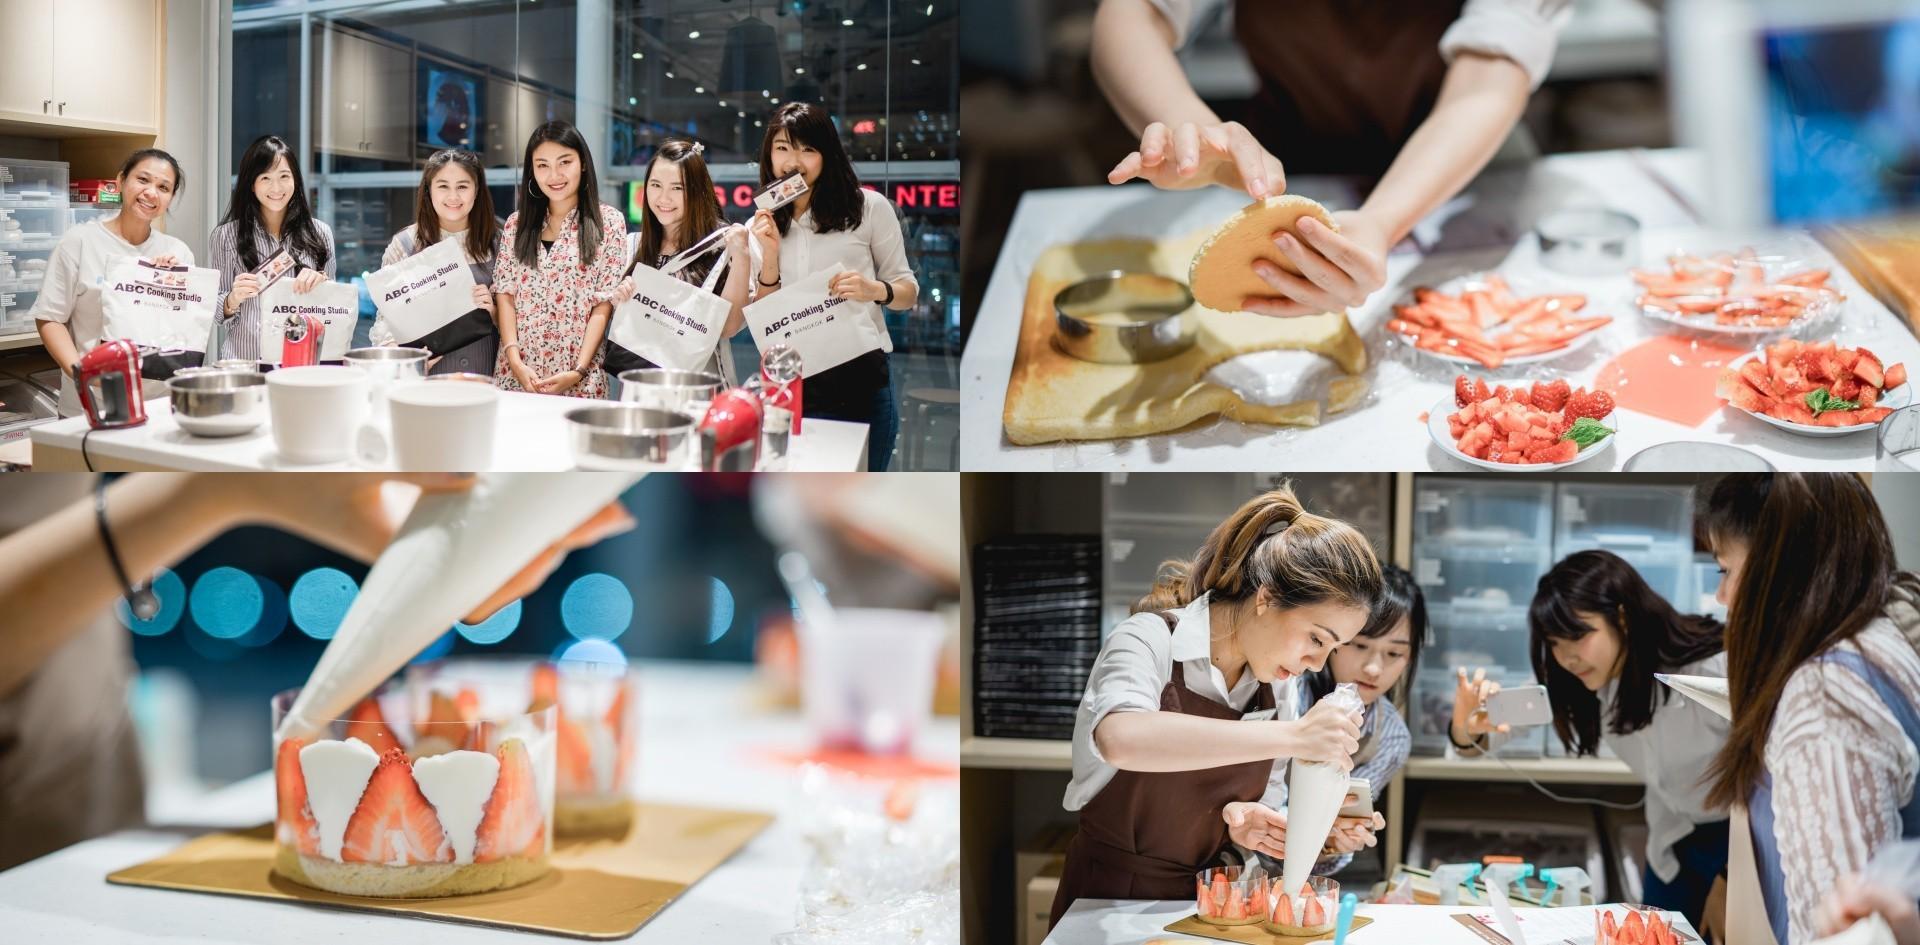 Wongnai Cooking Workshop ทำขนมสไตล์ญี่ปุ่นที่ ABC Cooking Studio